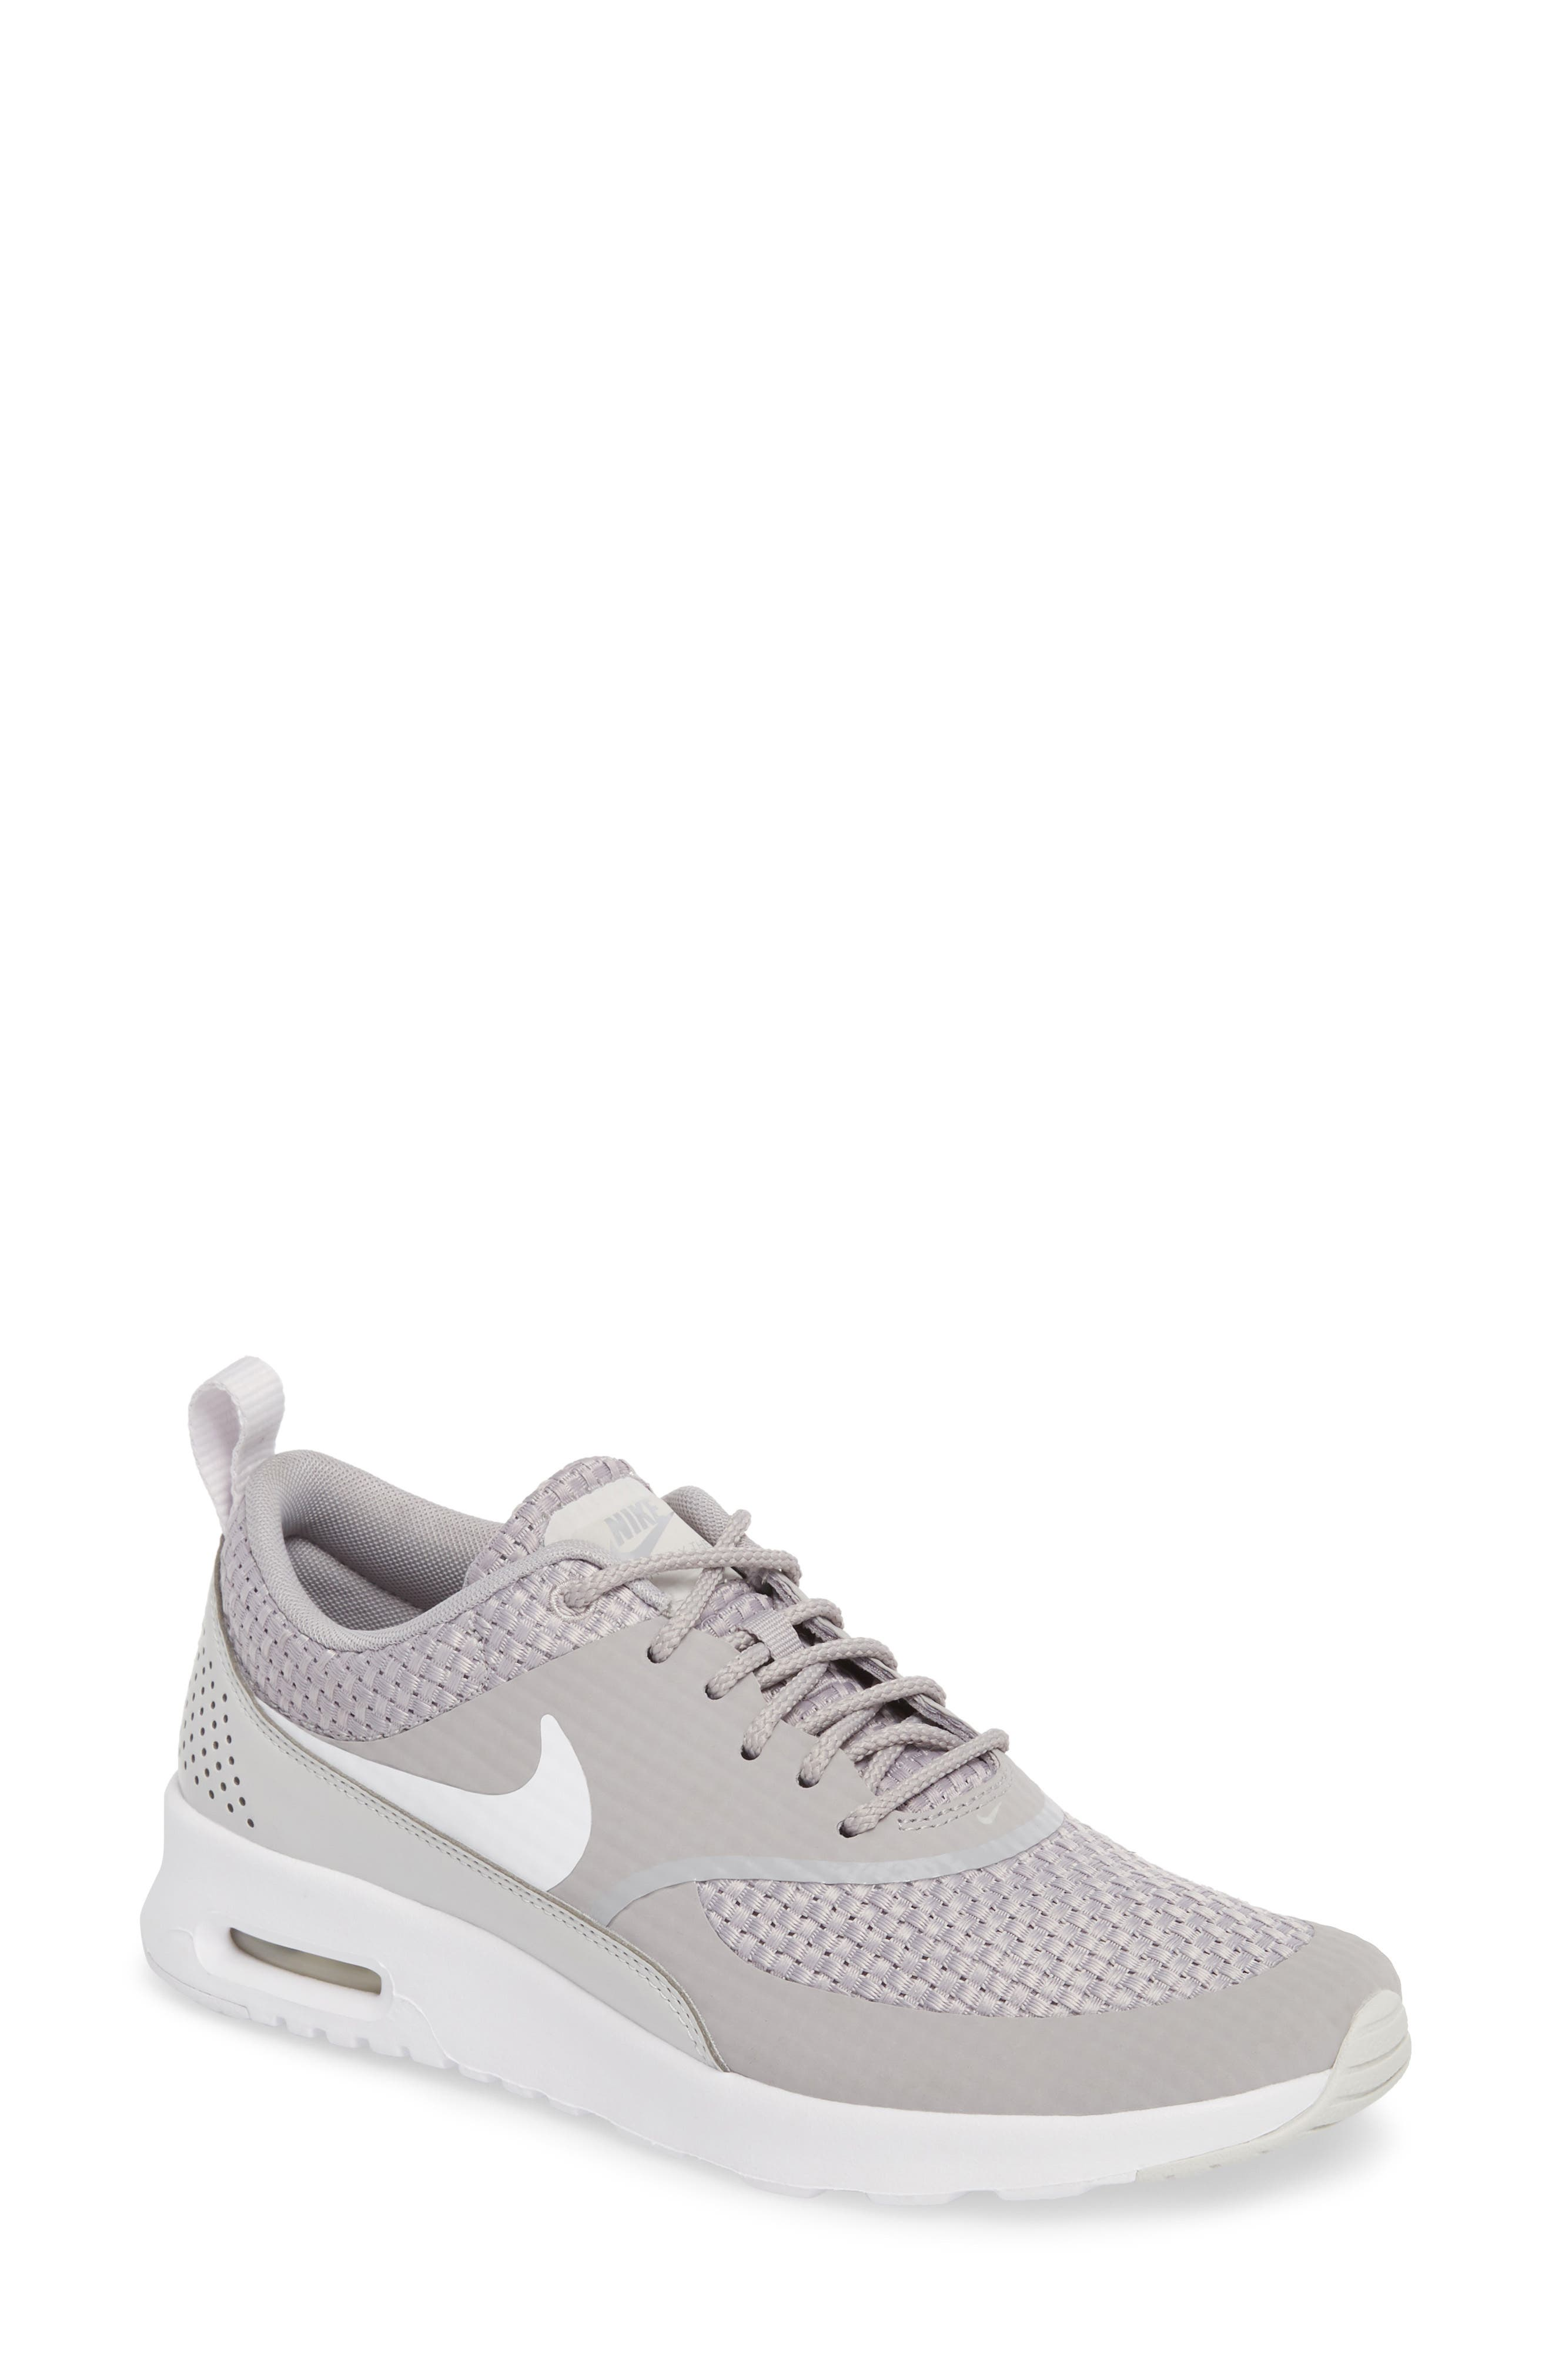 Air Max Thea Sneaker,                             Main thumbnail 1, color,                             ATMOSPHERE GREY/ WHITE